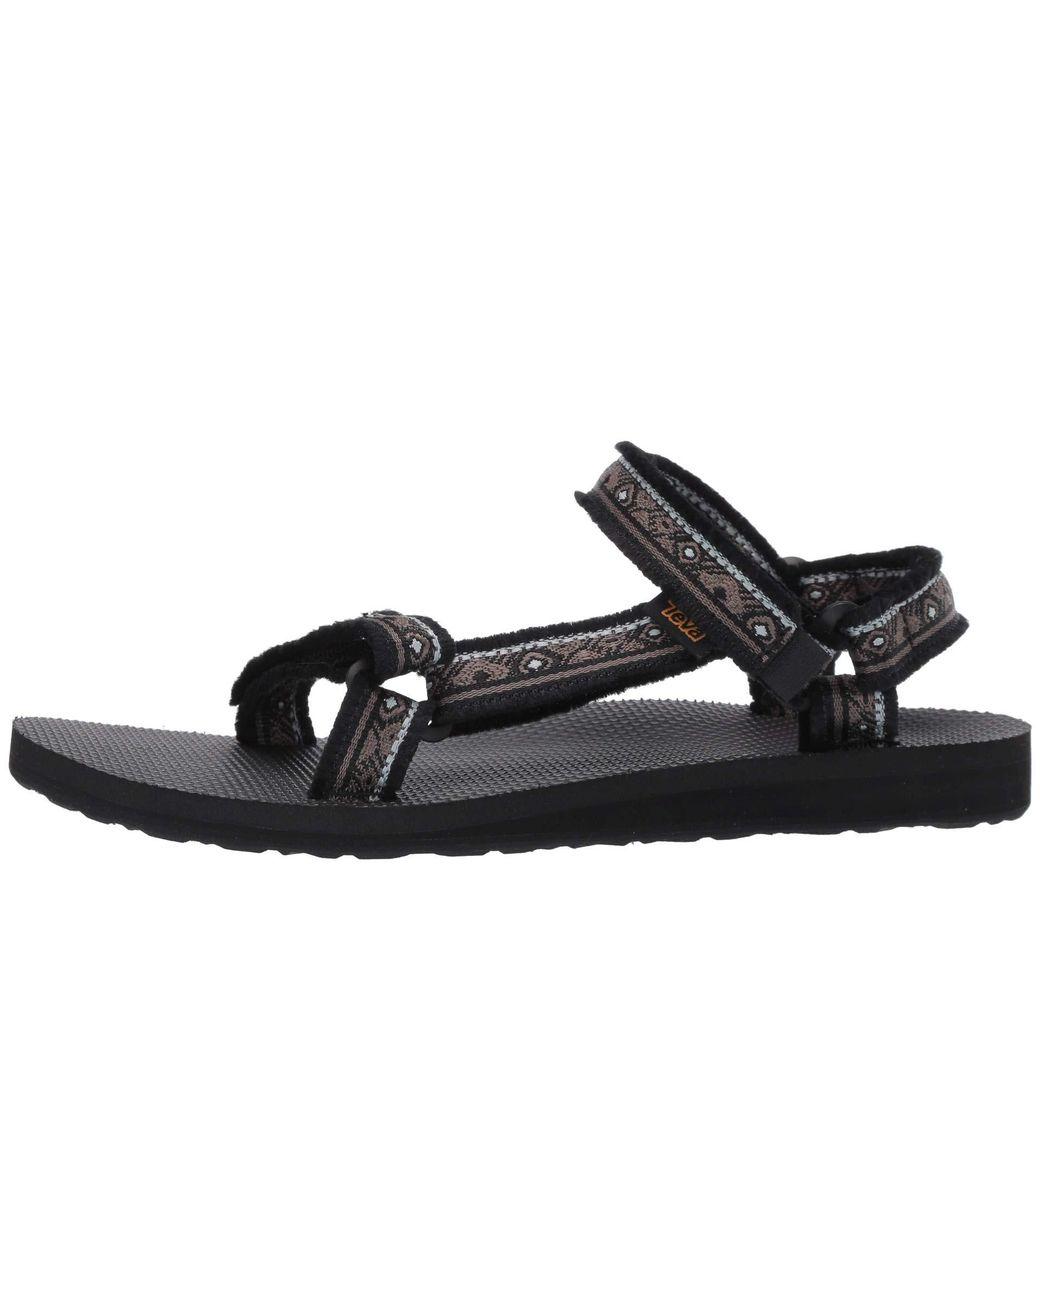 ba11ec21c Lyst - Teva Original Universal Maressa (maressa Sunflower Multi) Women s  Shoes in Black